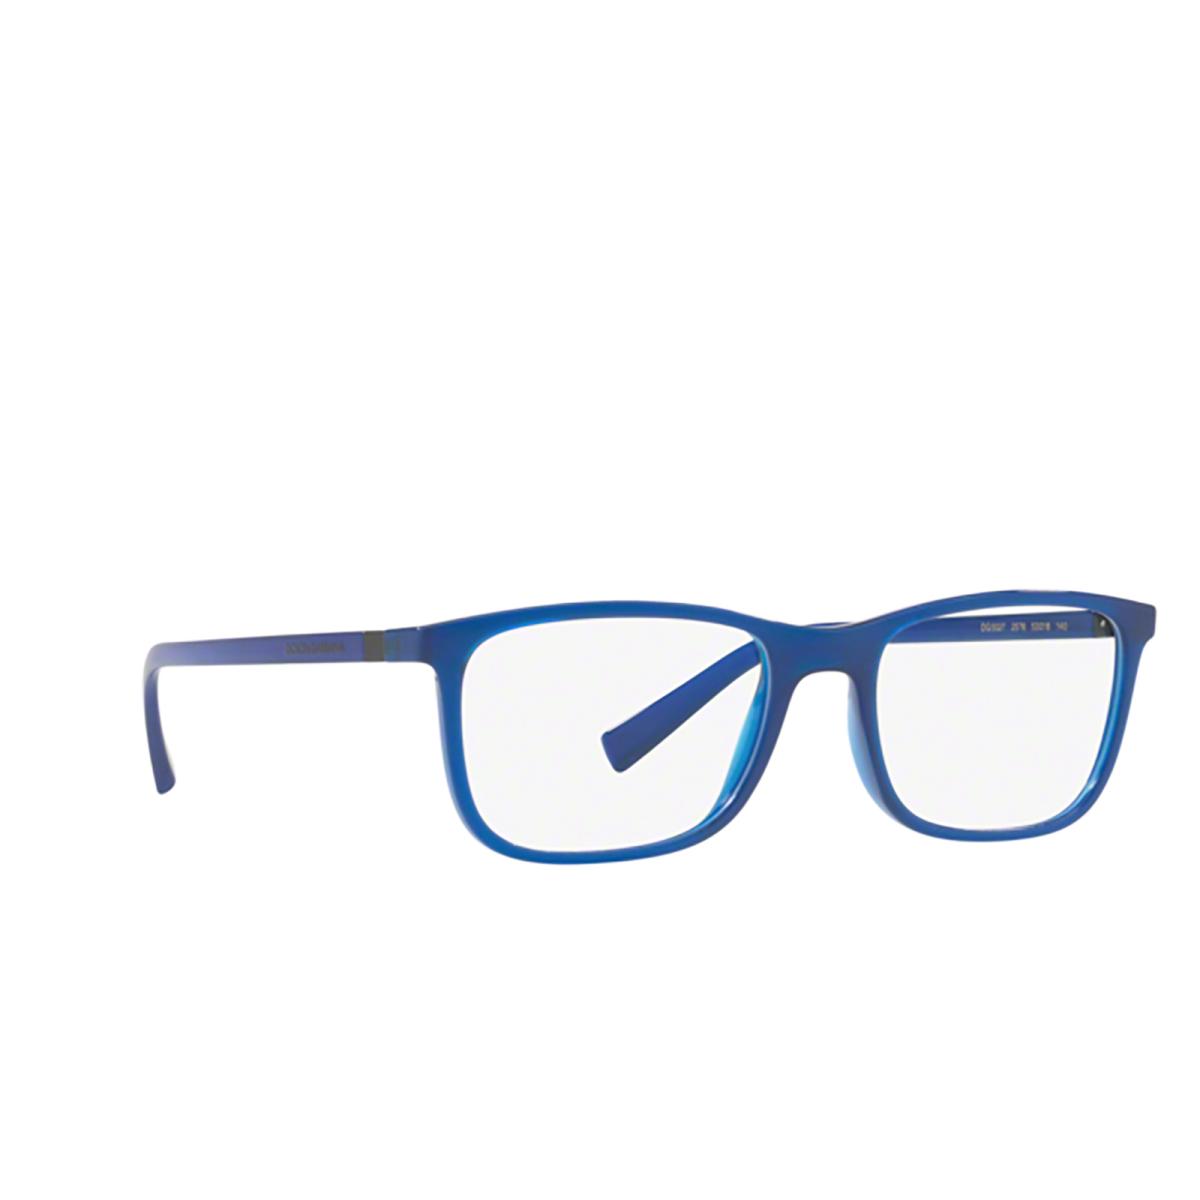 Dolce & Gabbana® Rectangle Eyeglasses: DG5027 color Transparent Blue 2578.